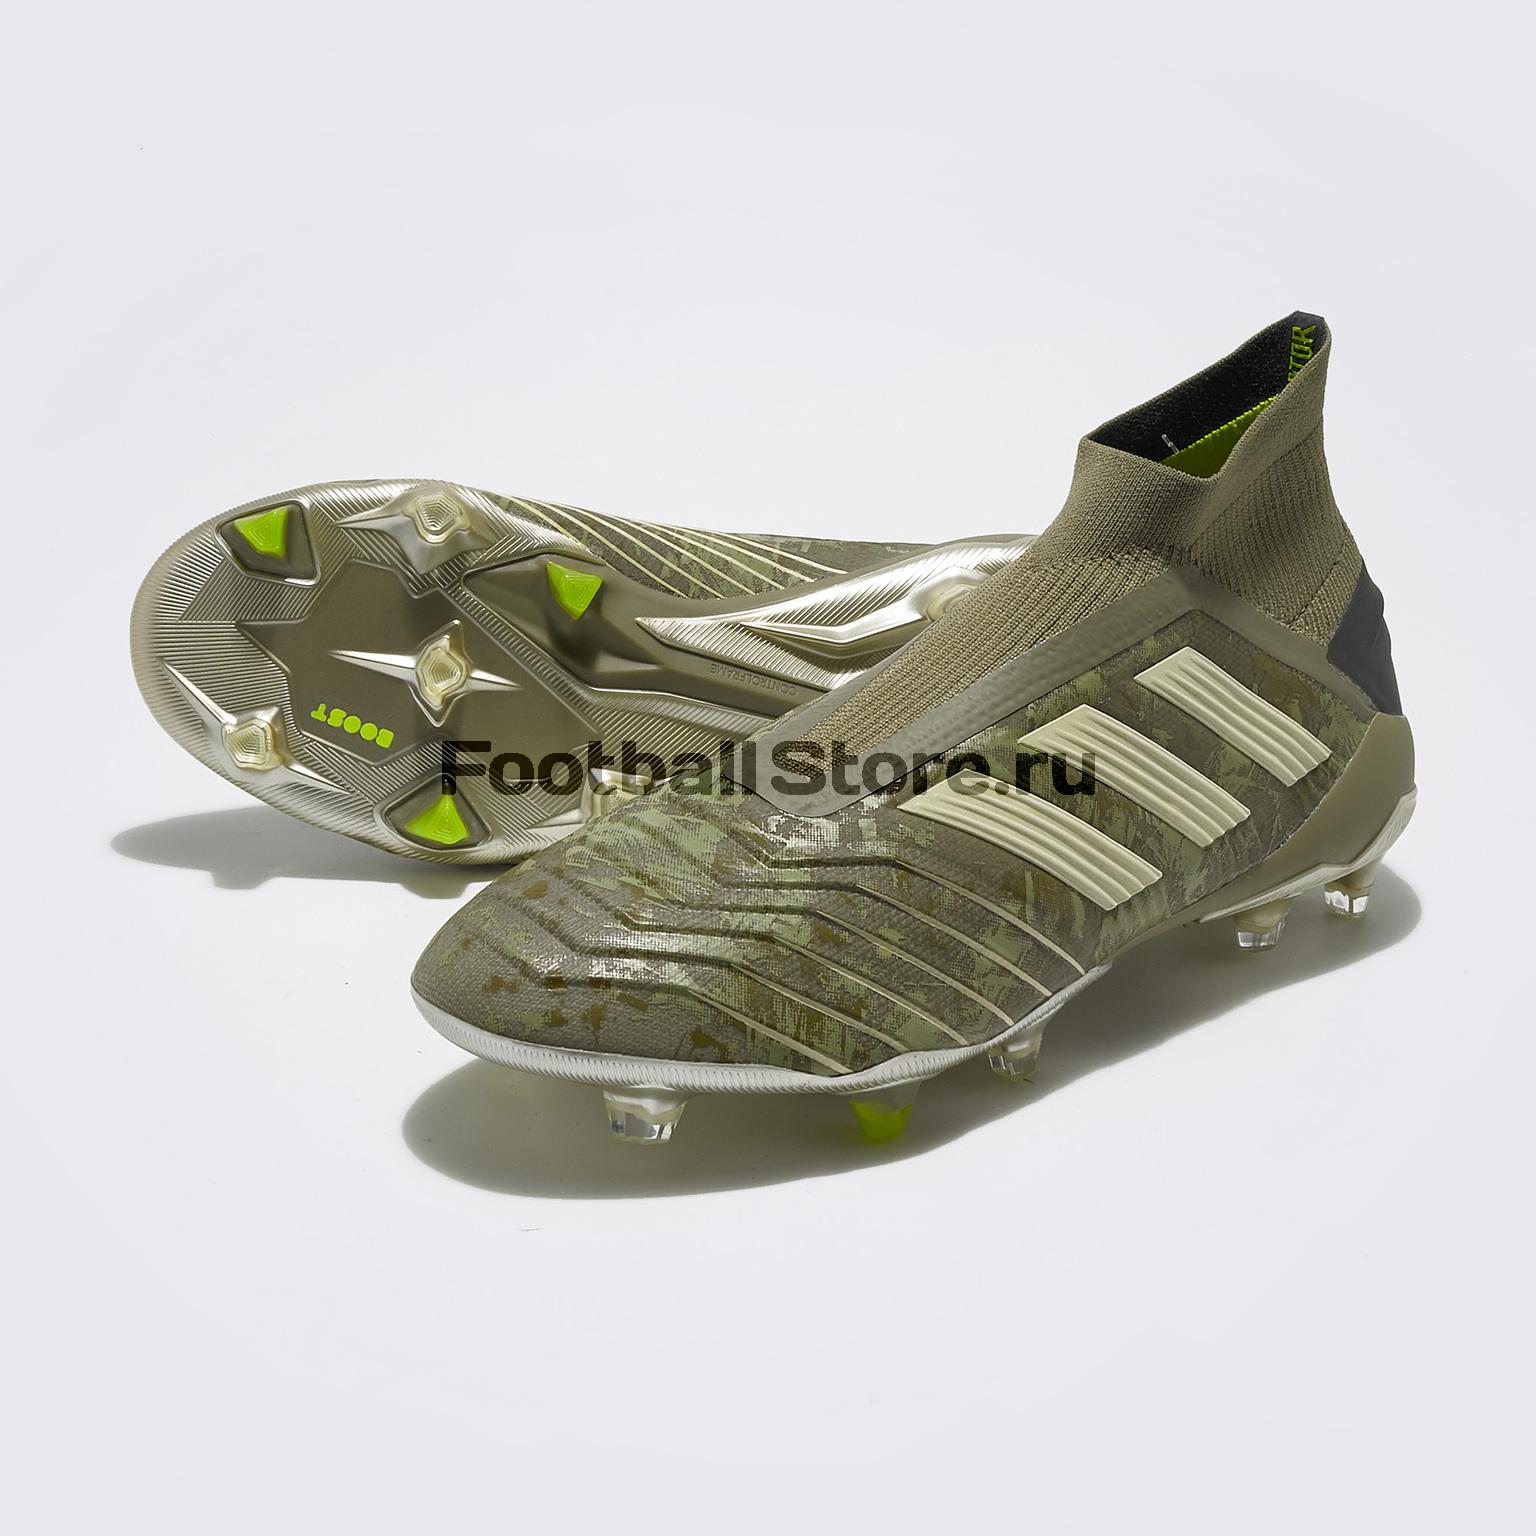 цена на Бутсы Adidas Predator 19+ FG EF8204